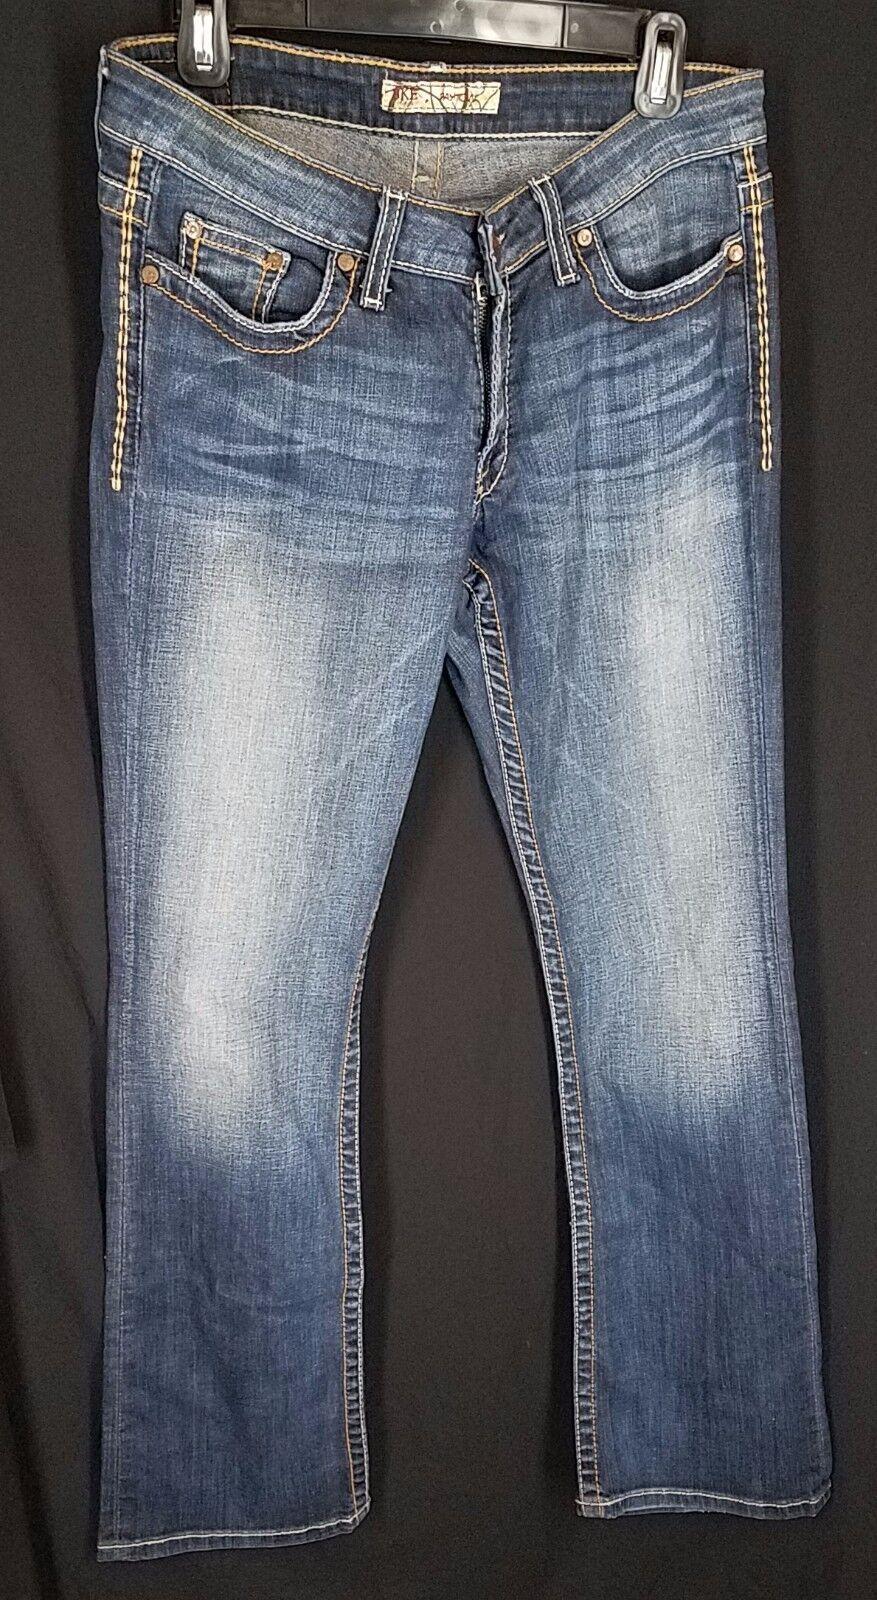 BKE Denim Jeans womens size 28 x 31.5 Payton bluee